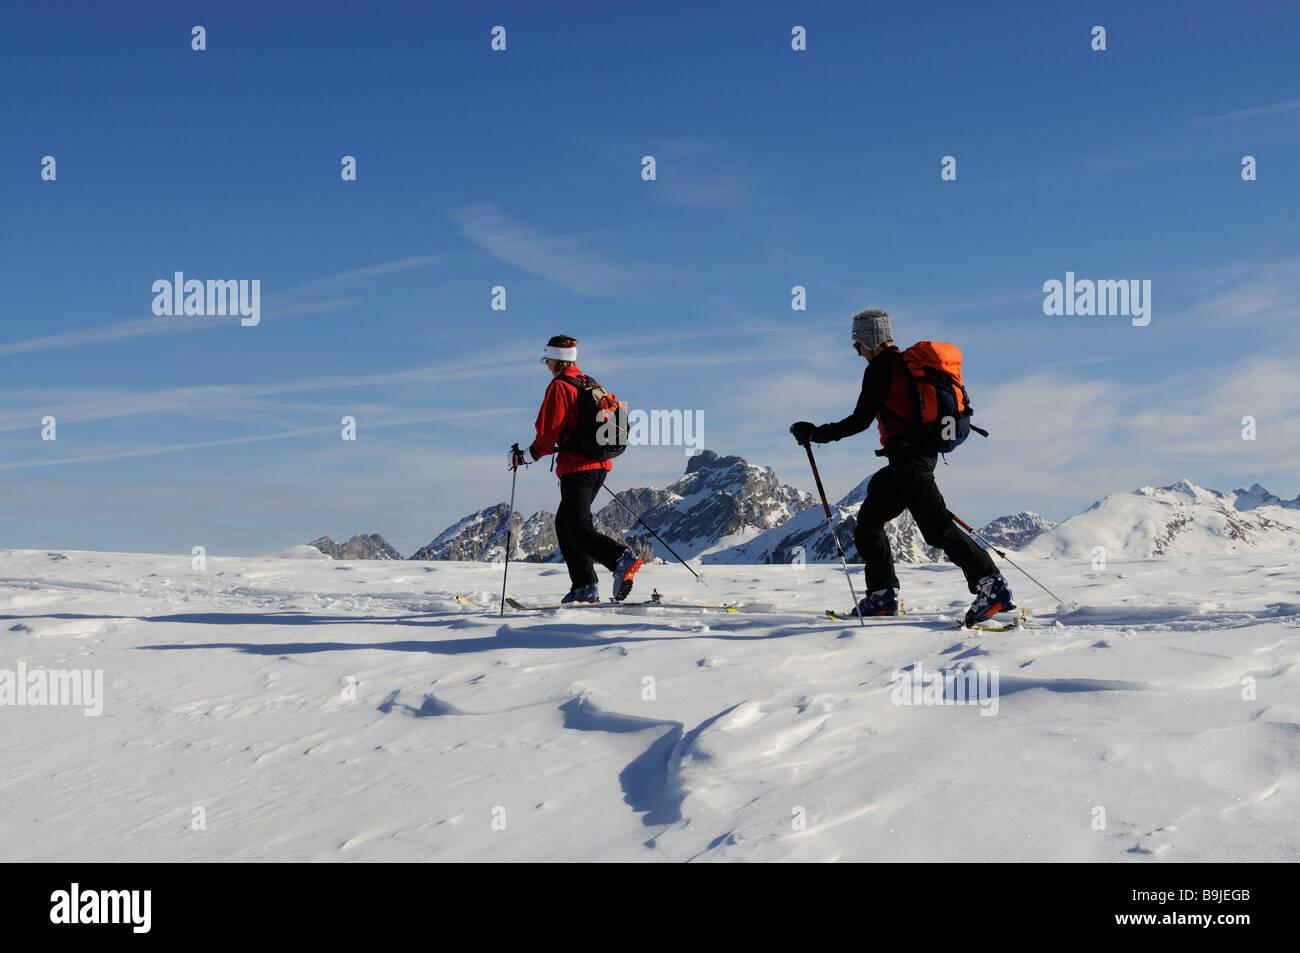 Ski alpinists on Parwengsattel, Sankt Stephan, Zweisimmen, Saanenland, Western Alps, Bernese Oberland, Switzerland, - Stock Image